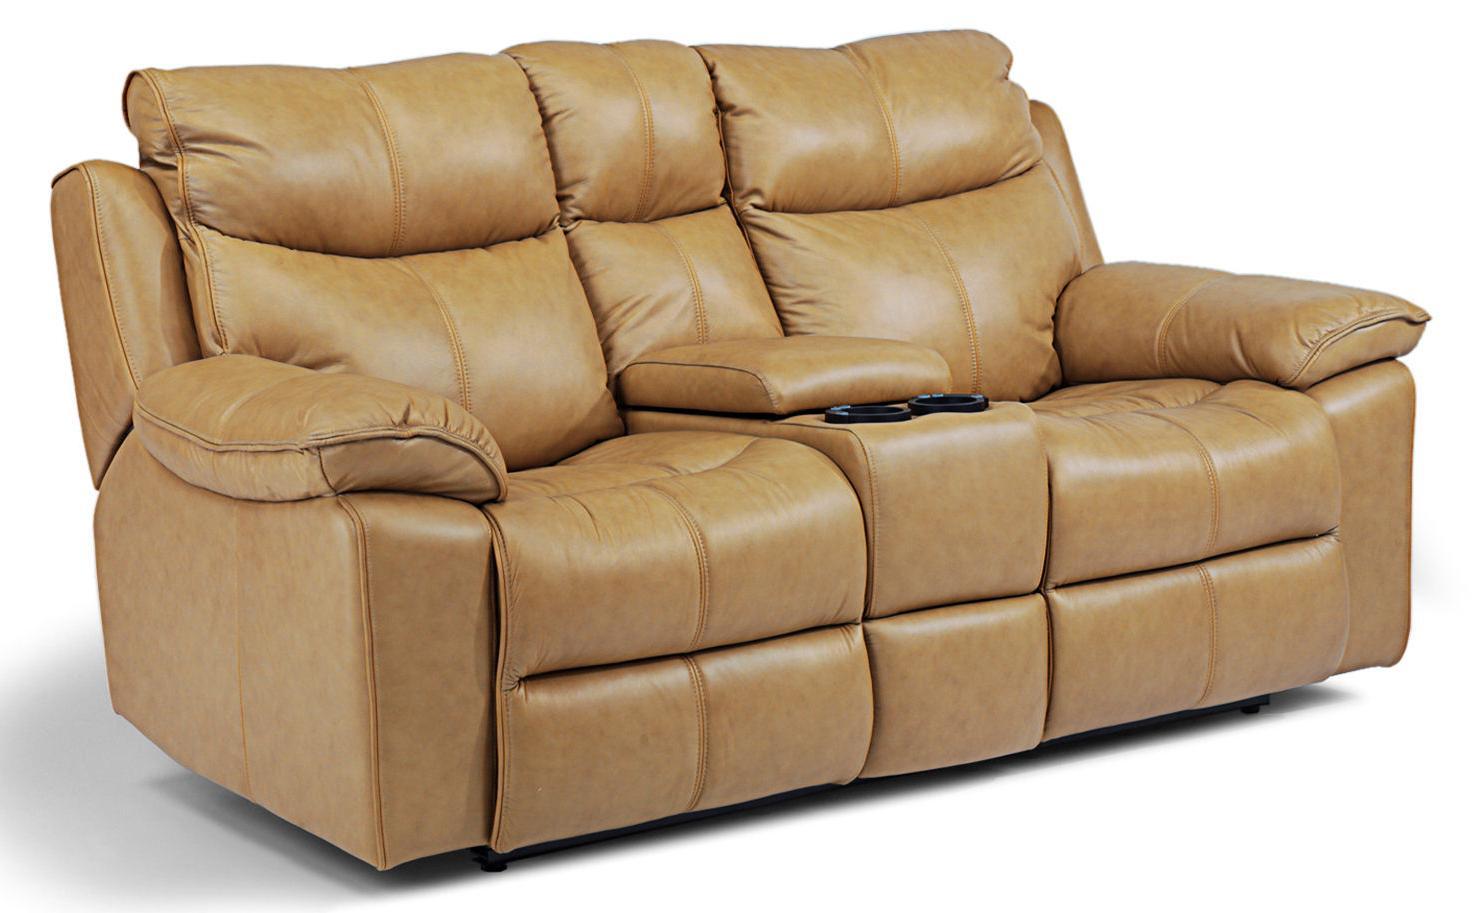 Flexsteel Latitudes - Julio Power Love Seat with Console - Item Number: 1320-604P